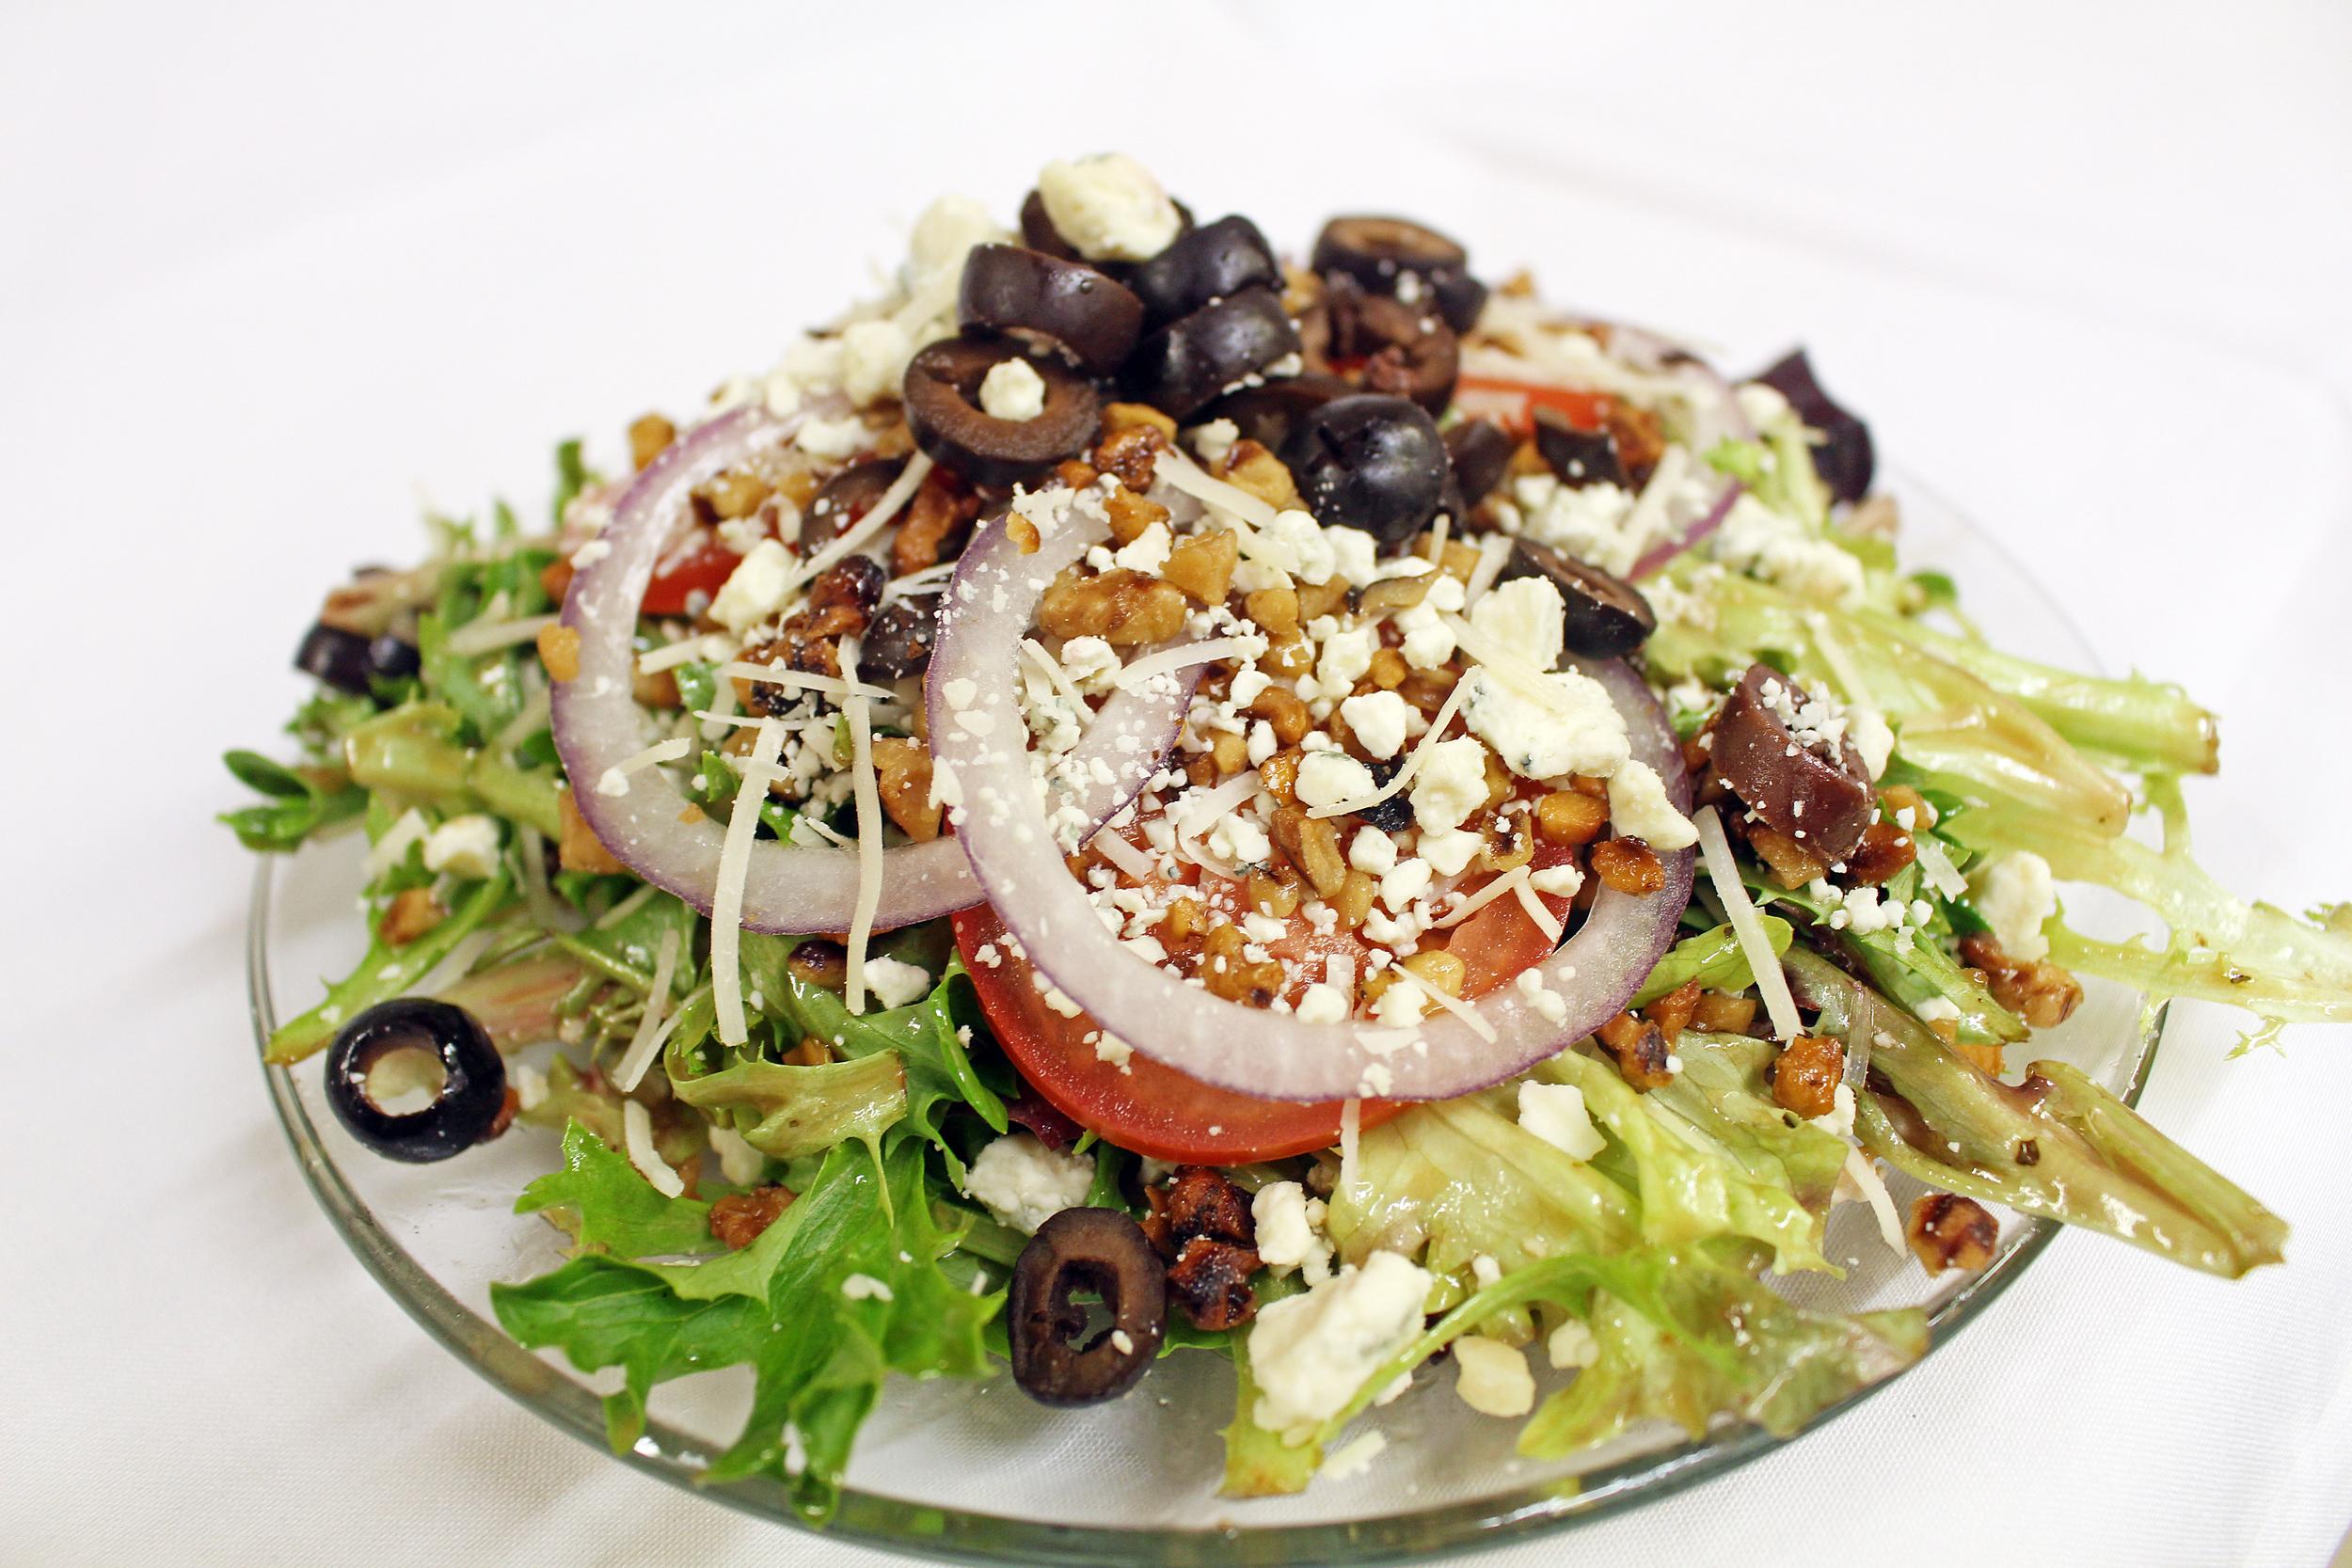 Martolli's Salad